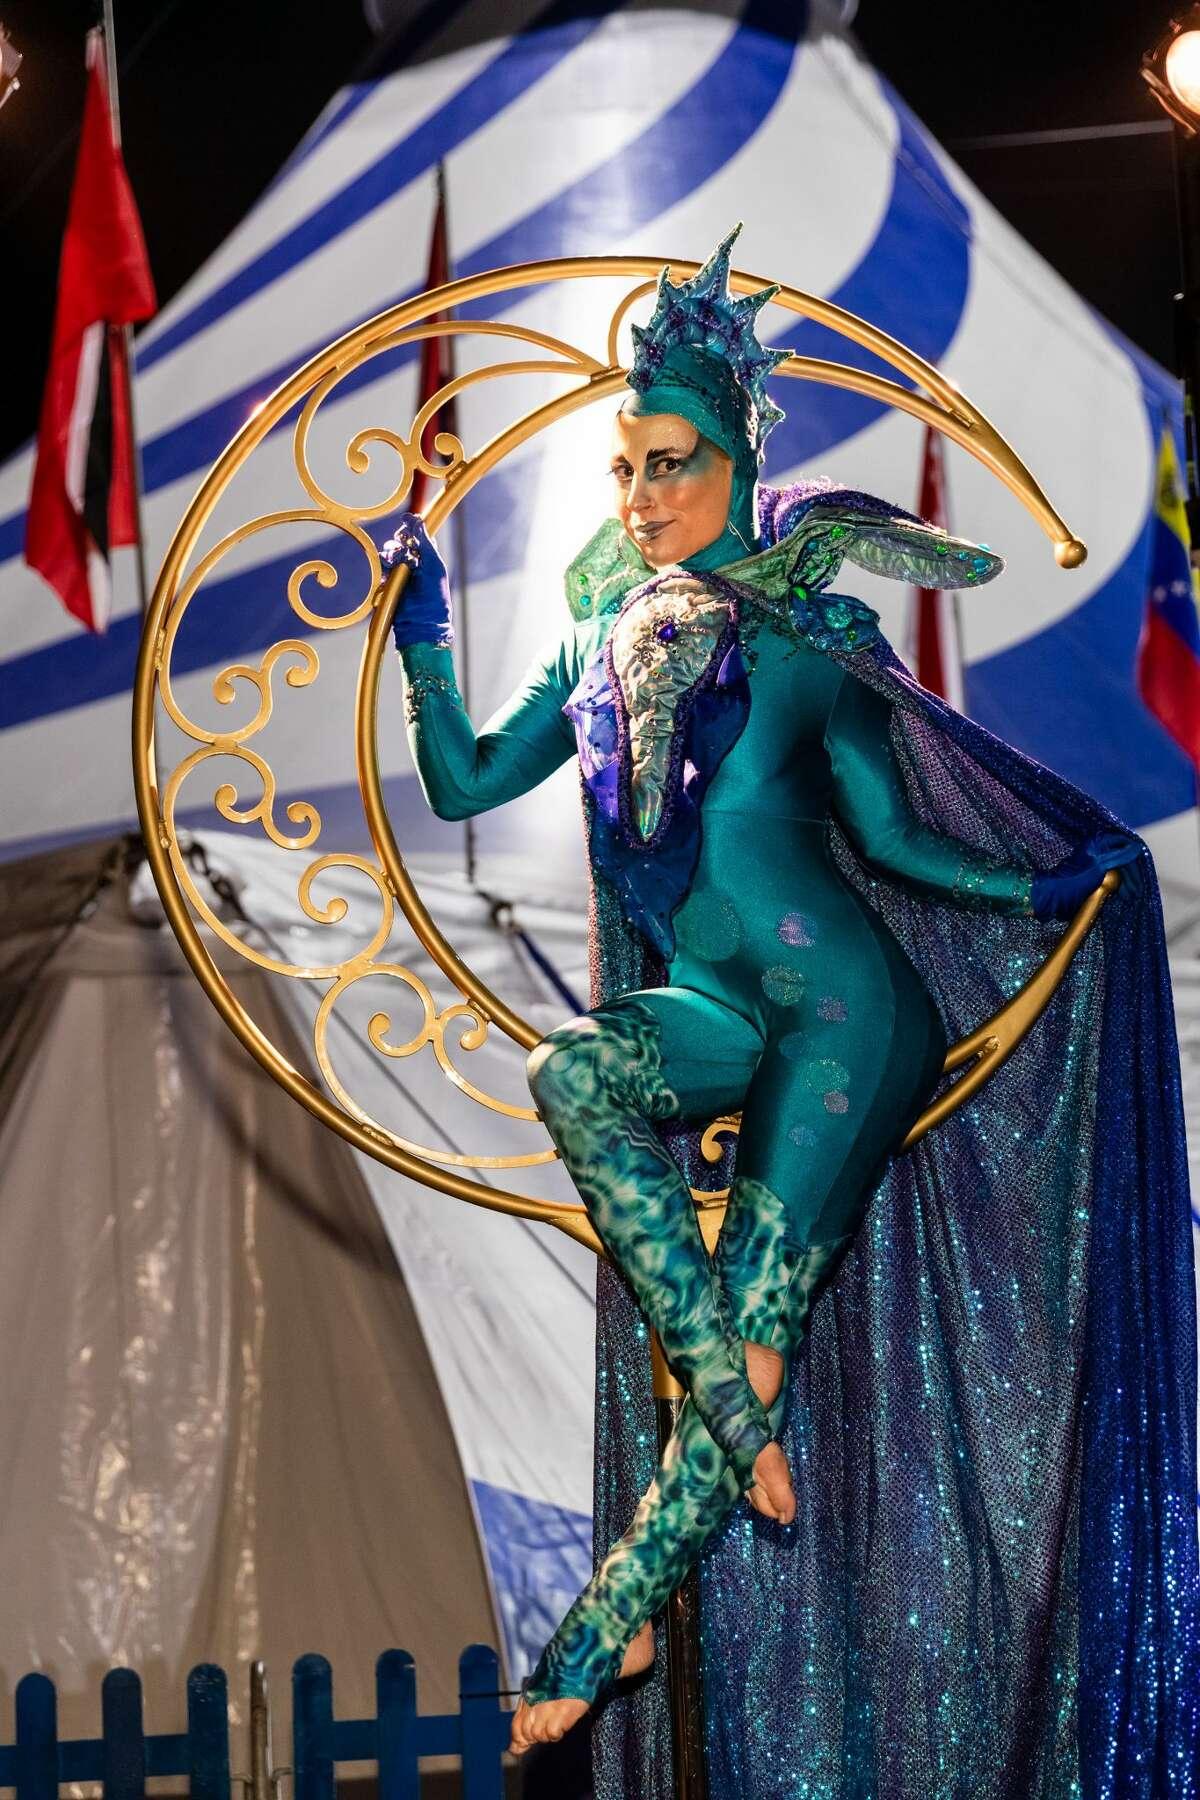 Cirque du Soleil Artist attends Premiere of AMALUNA by Cirque du Soleil on November 7th 2019 at Oracle Park in San Francisco.